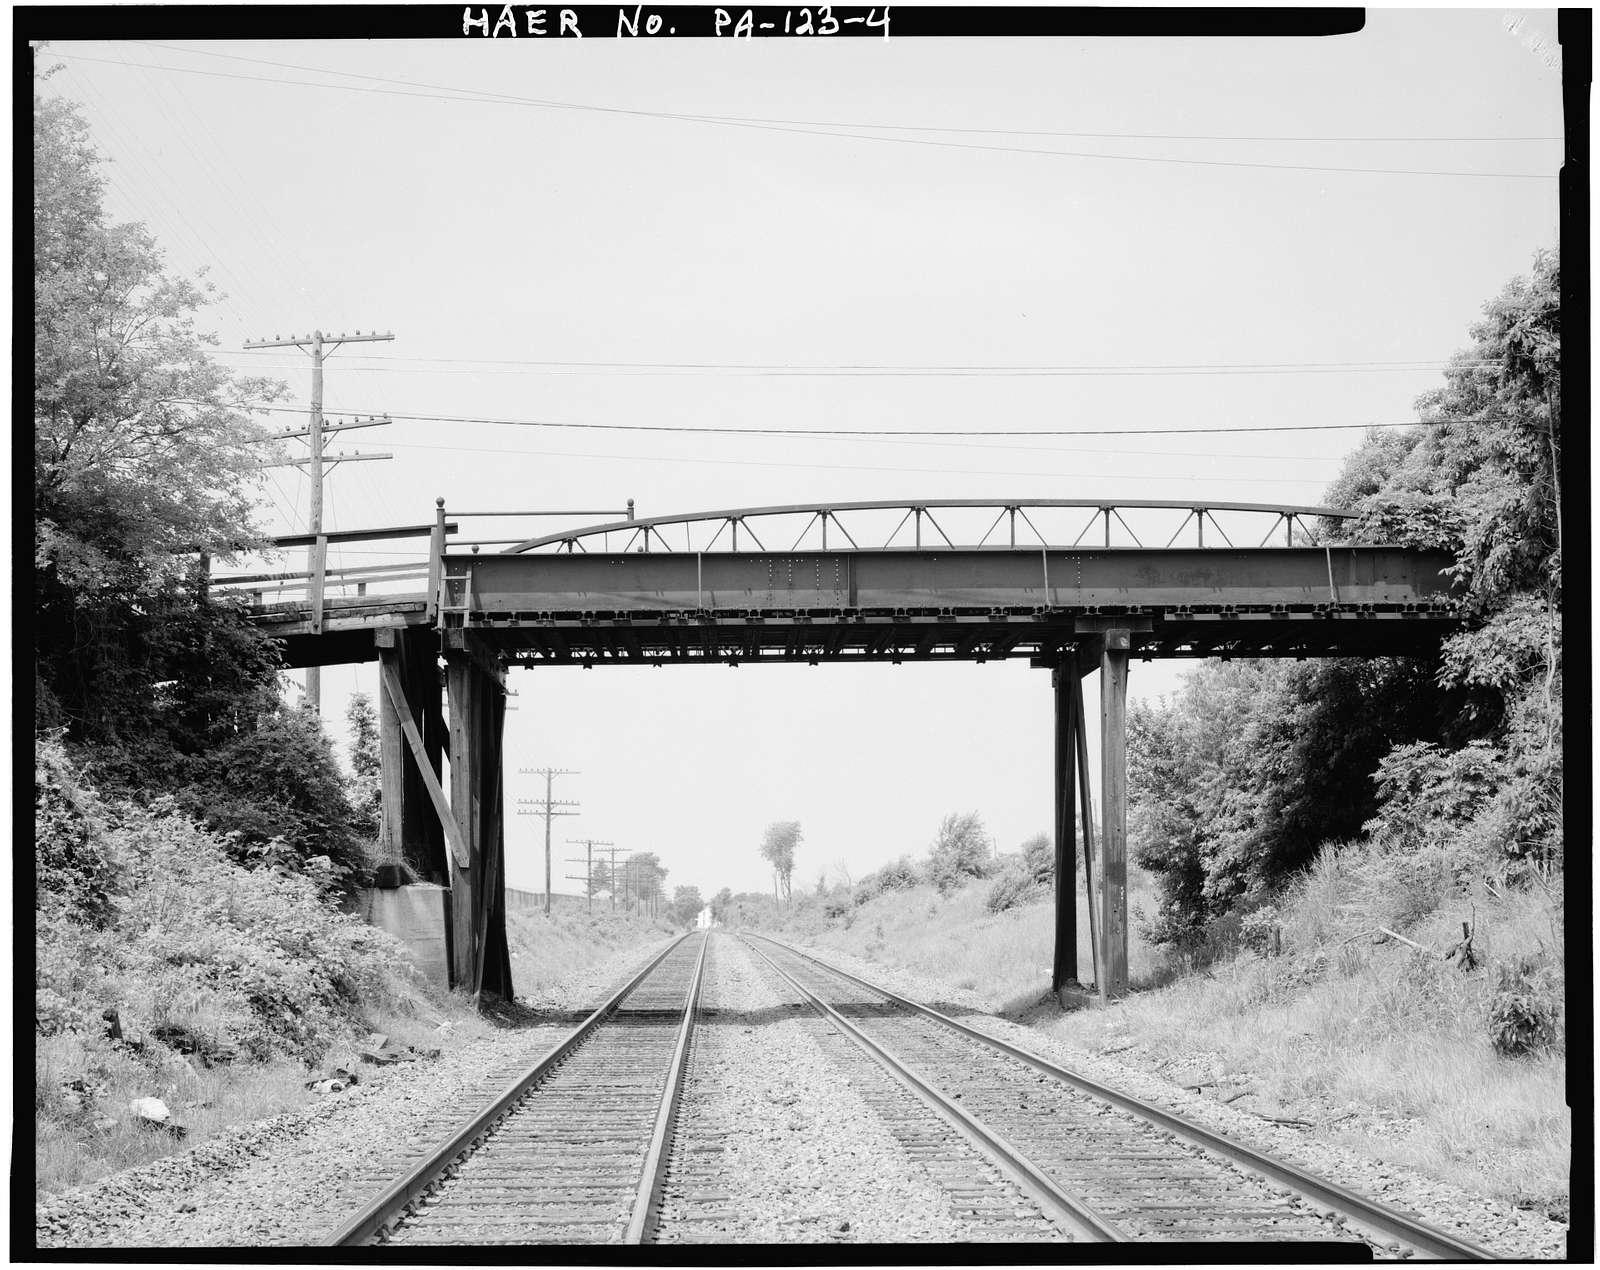 Tank Farm Road Bridge, Tank Farm Road crossing Reading Railroad tracks, Emmaus, Lehigh County, PA